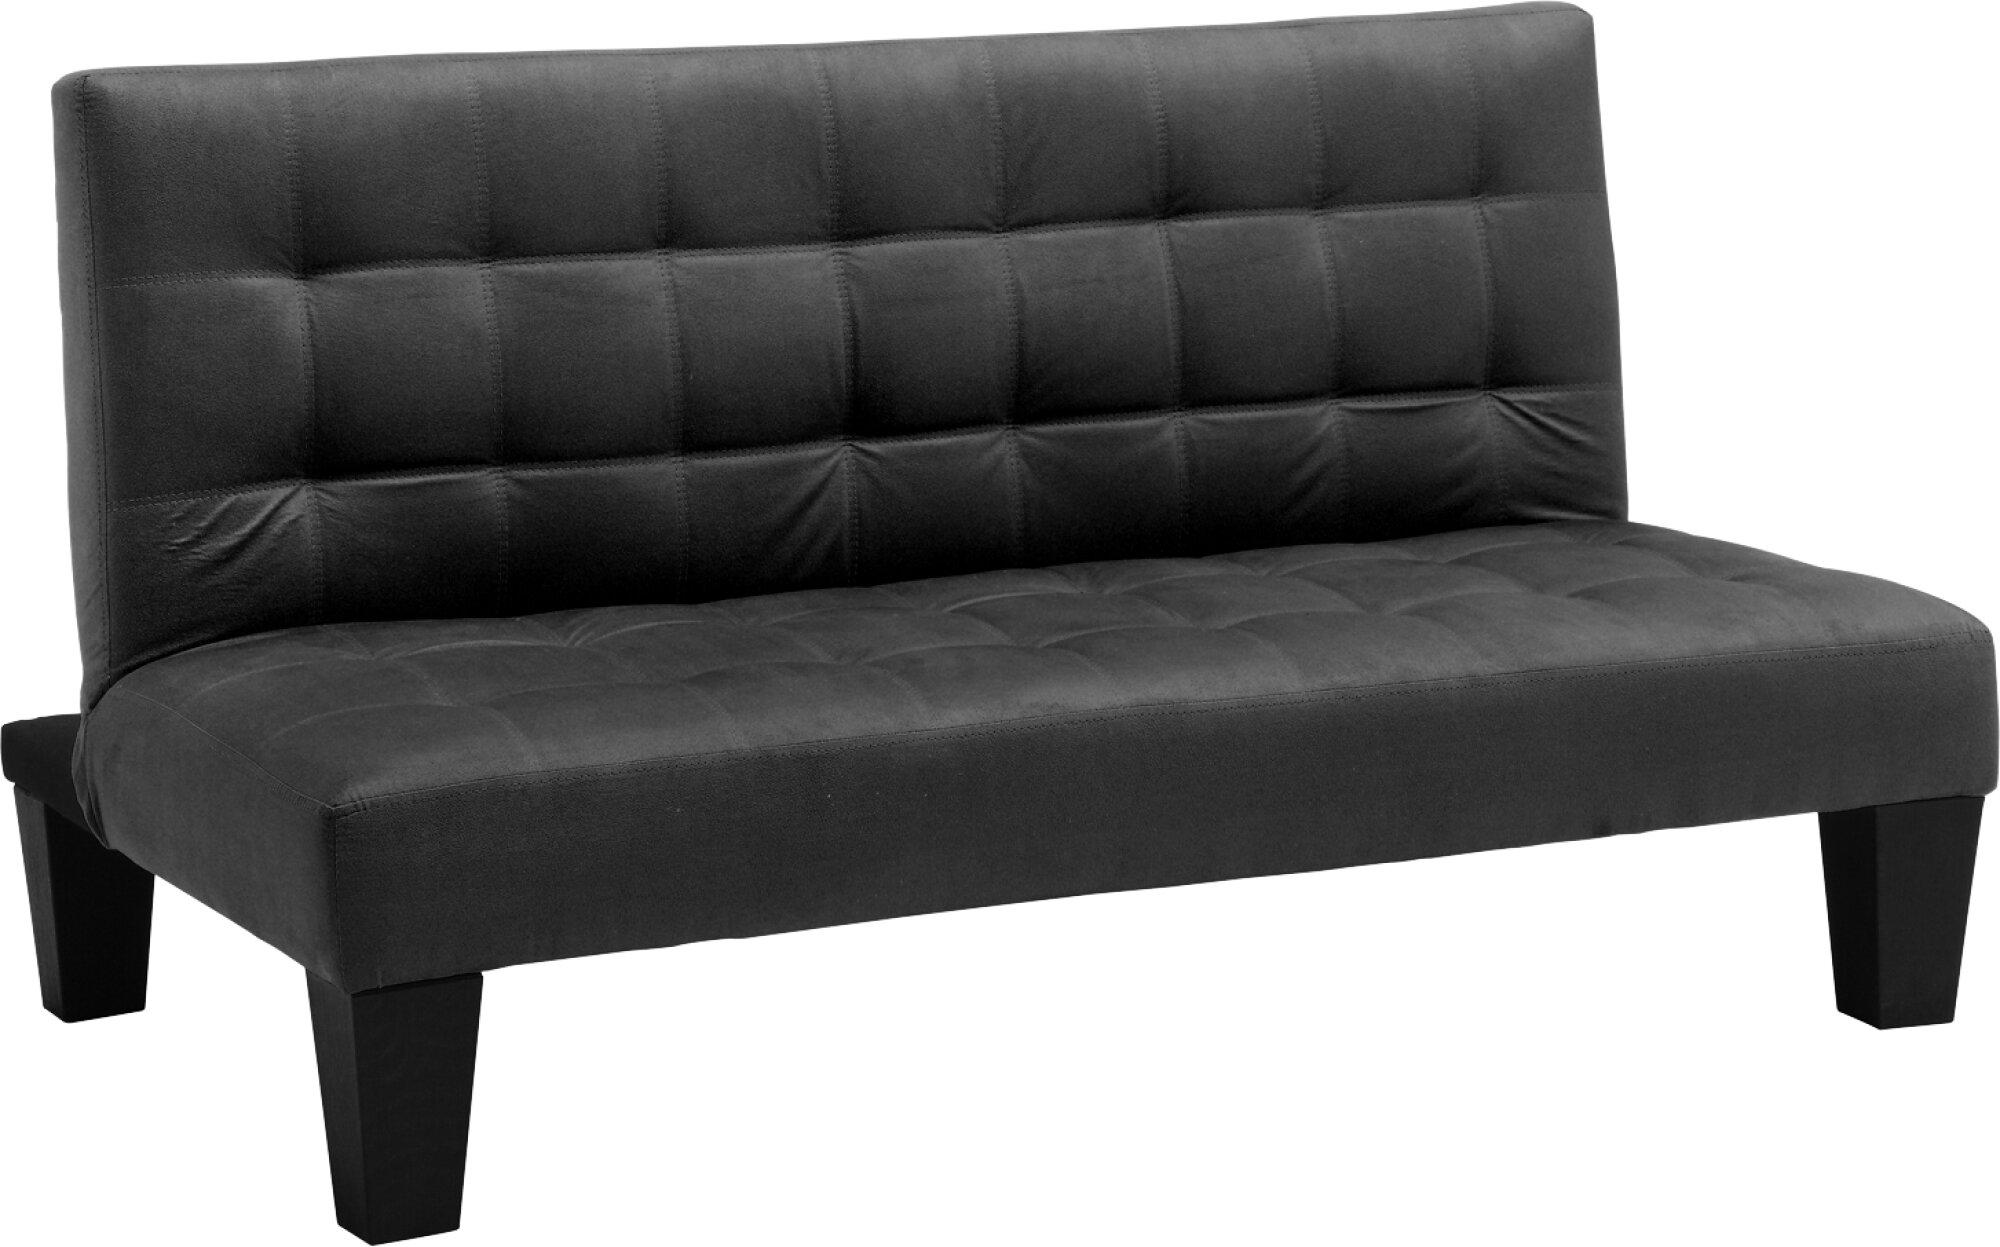 Convertible Futon Lounger Fold Down Mini Guest Bed Sofa